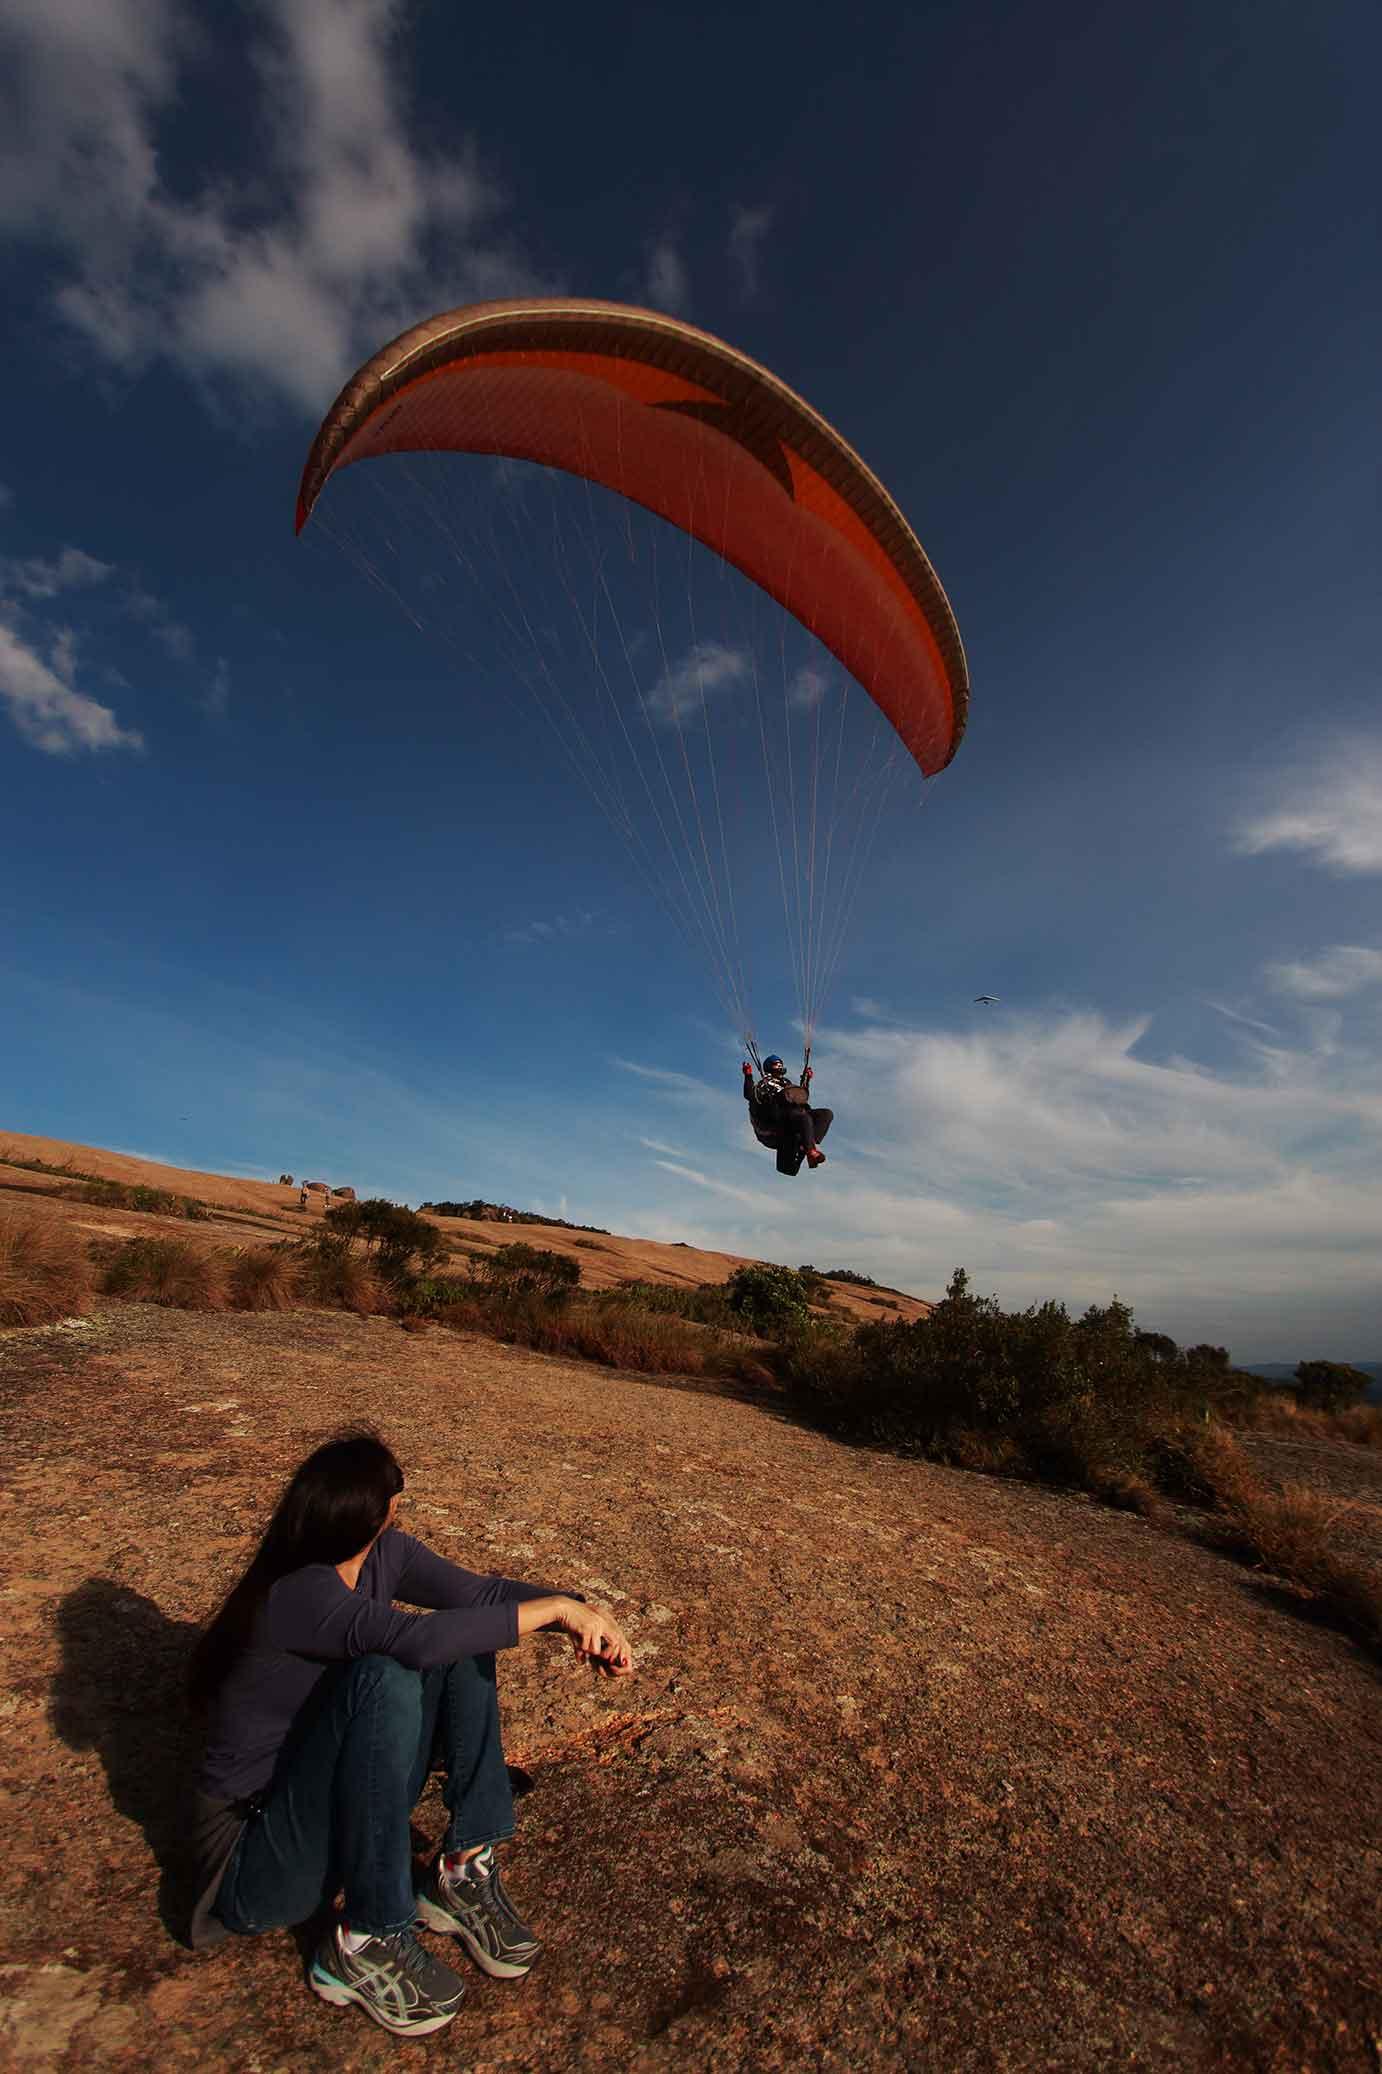 Marcio-Masulino-Atibaia-Pedra-Grande-paraglider-IMG_0372-bx